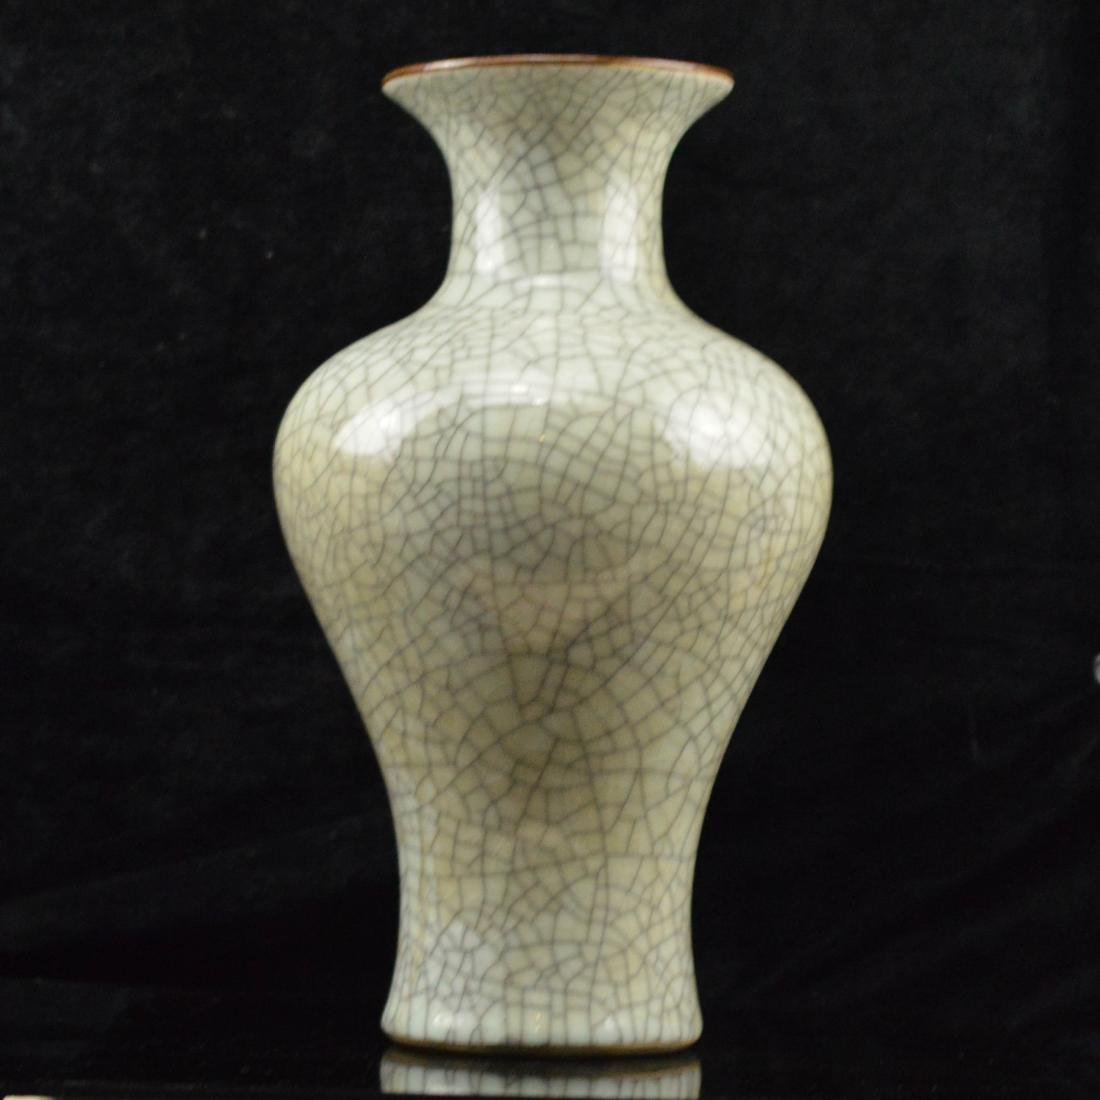 Guan Yao Porcelain vase